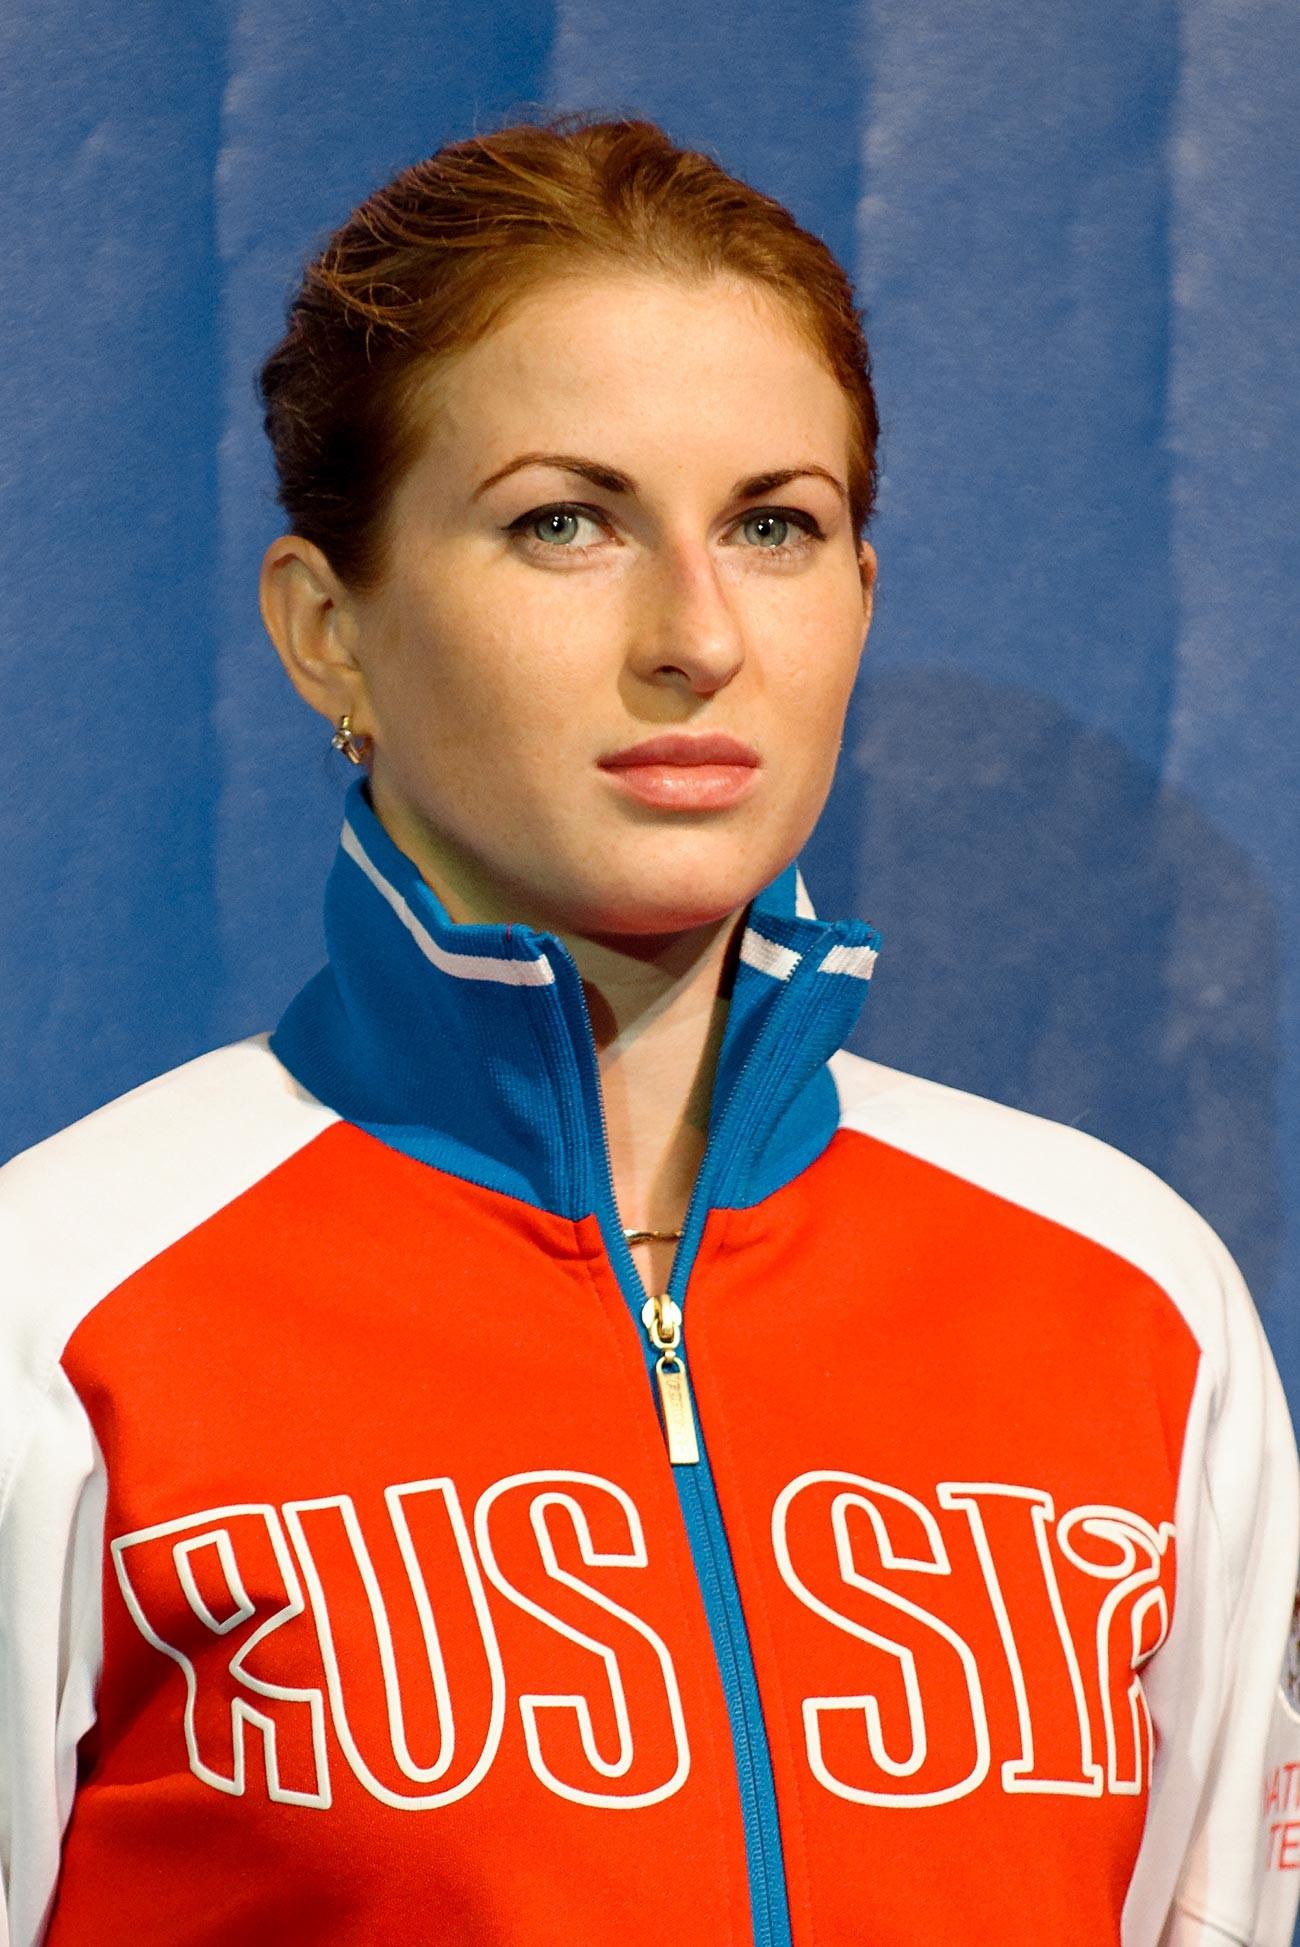 Atlet Rusia Inna Deriglazova berdiri di podium anggar putri pada Kejuaraan Anggar Dunia 2013 di Syma Hall, Budapest, 10 Agustus 2013.